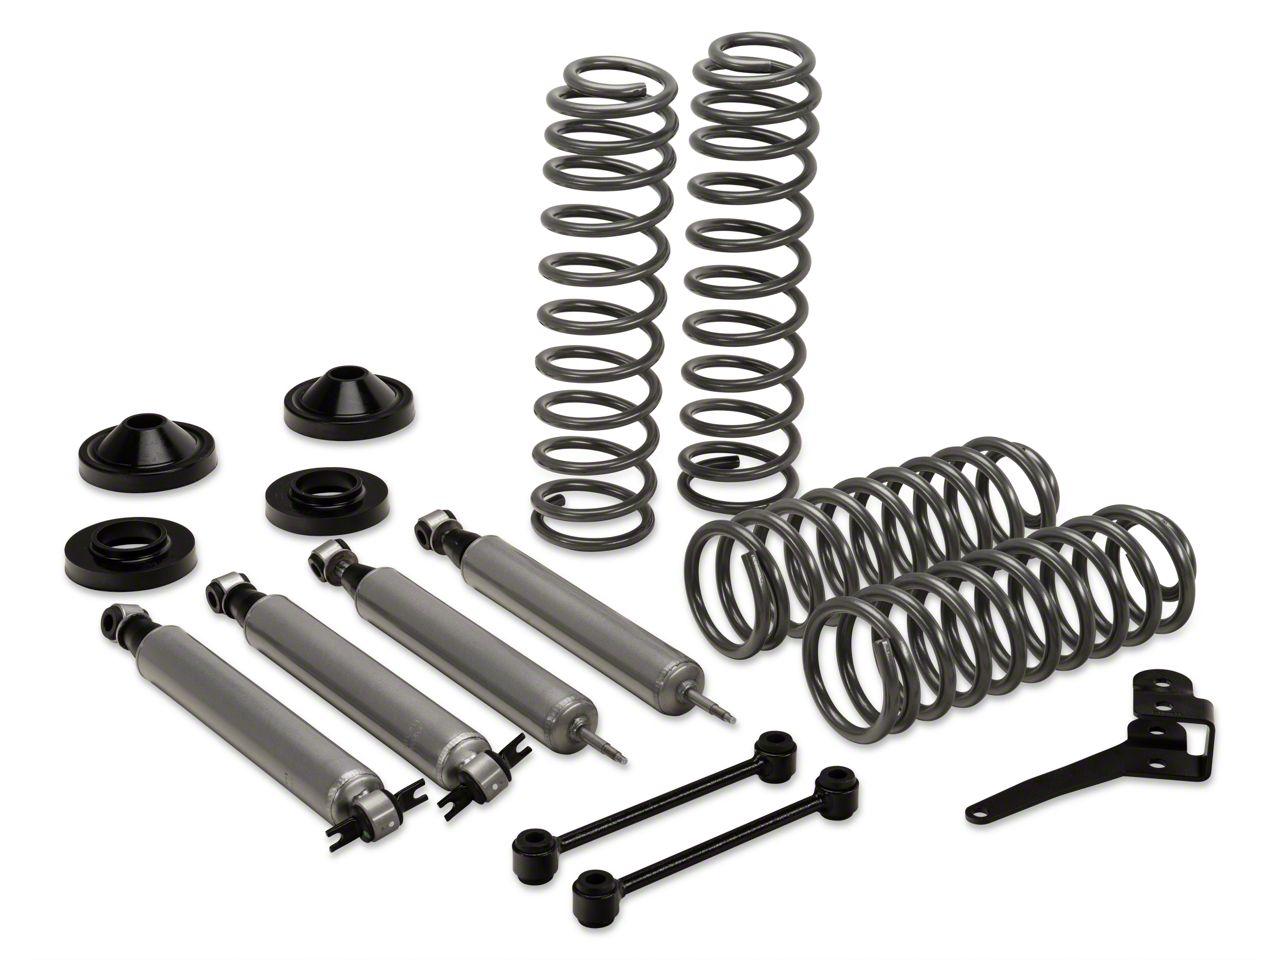 Rough Country 3.25 in. Suspension Lift Kit w/ Shocks (07-18 Jeep Wrangler JK 2 Door)